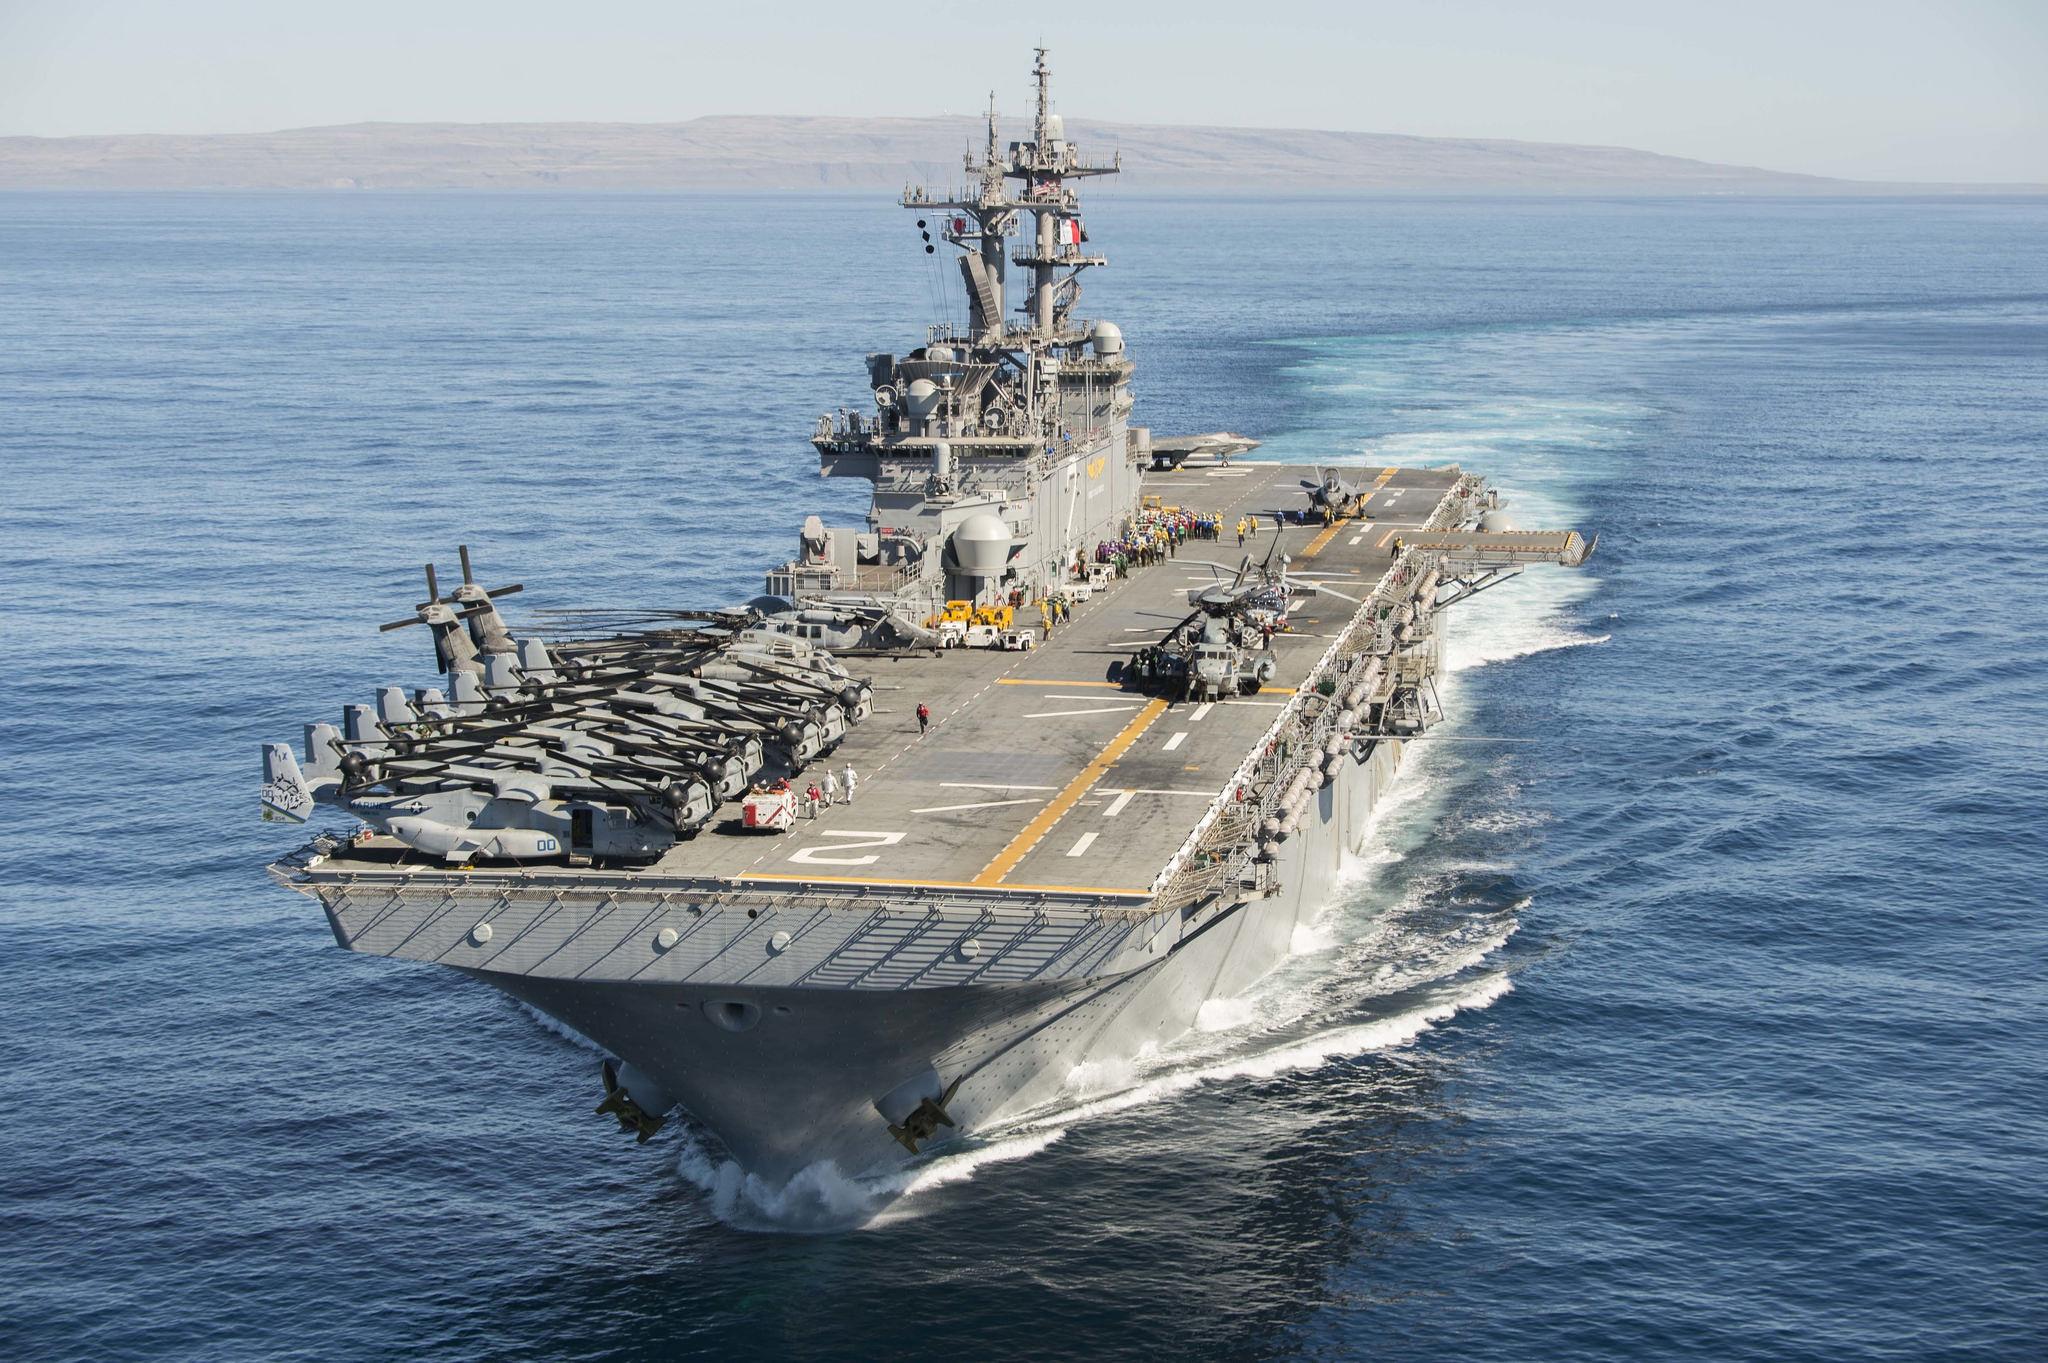 https://get.wallhere.com/photo/2048x1363-px-53-Pave-Low-mh-United-States-Navy-USS-Essex-1410885.jpg